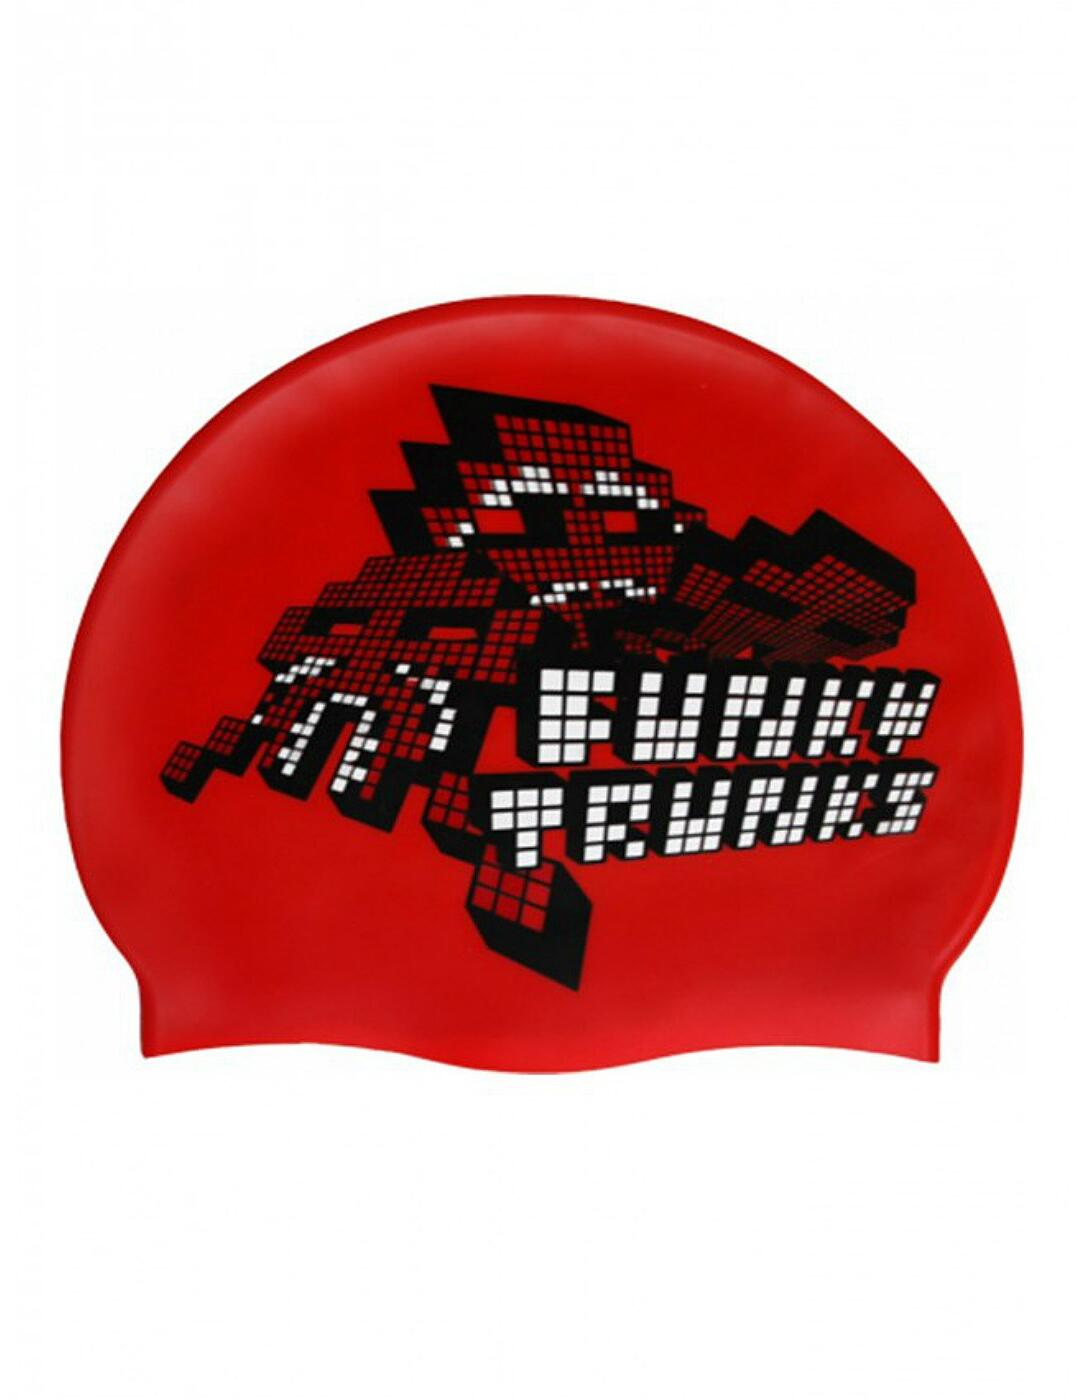 FT9900328 Funky Trunks Silicone Swimming Cap - FT9900679 La Furia